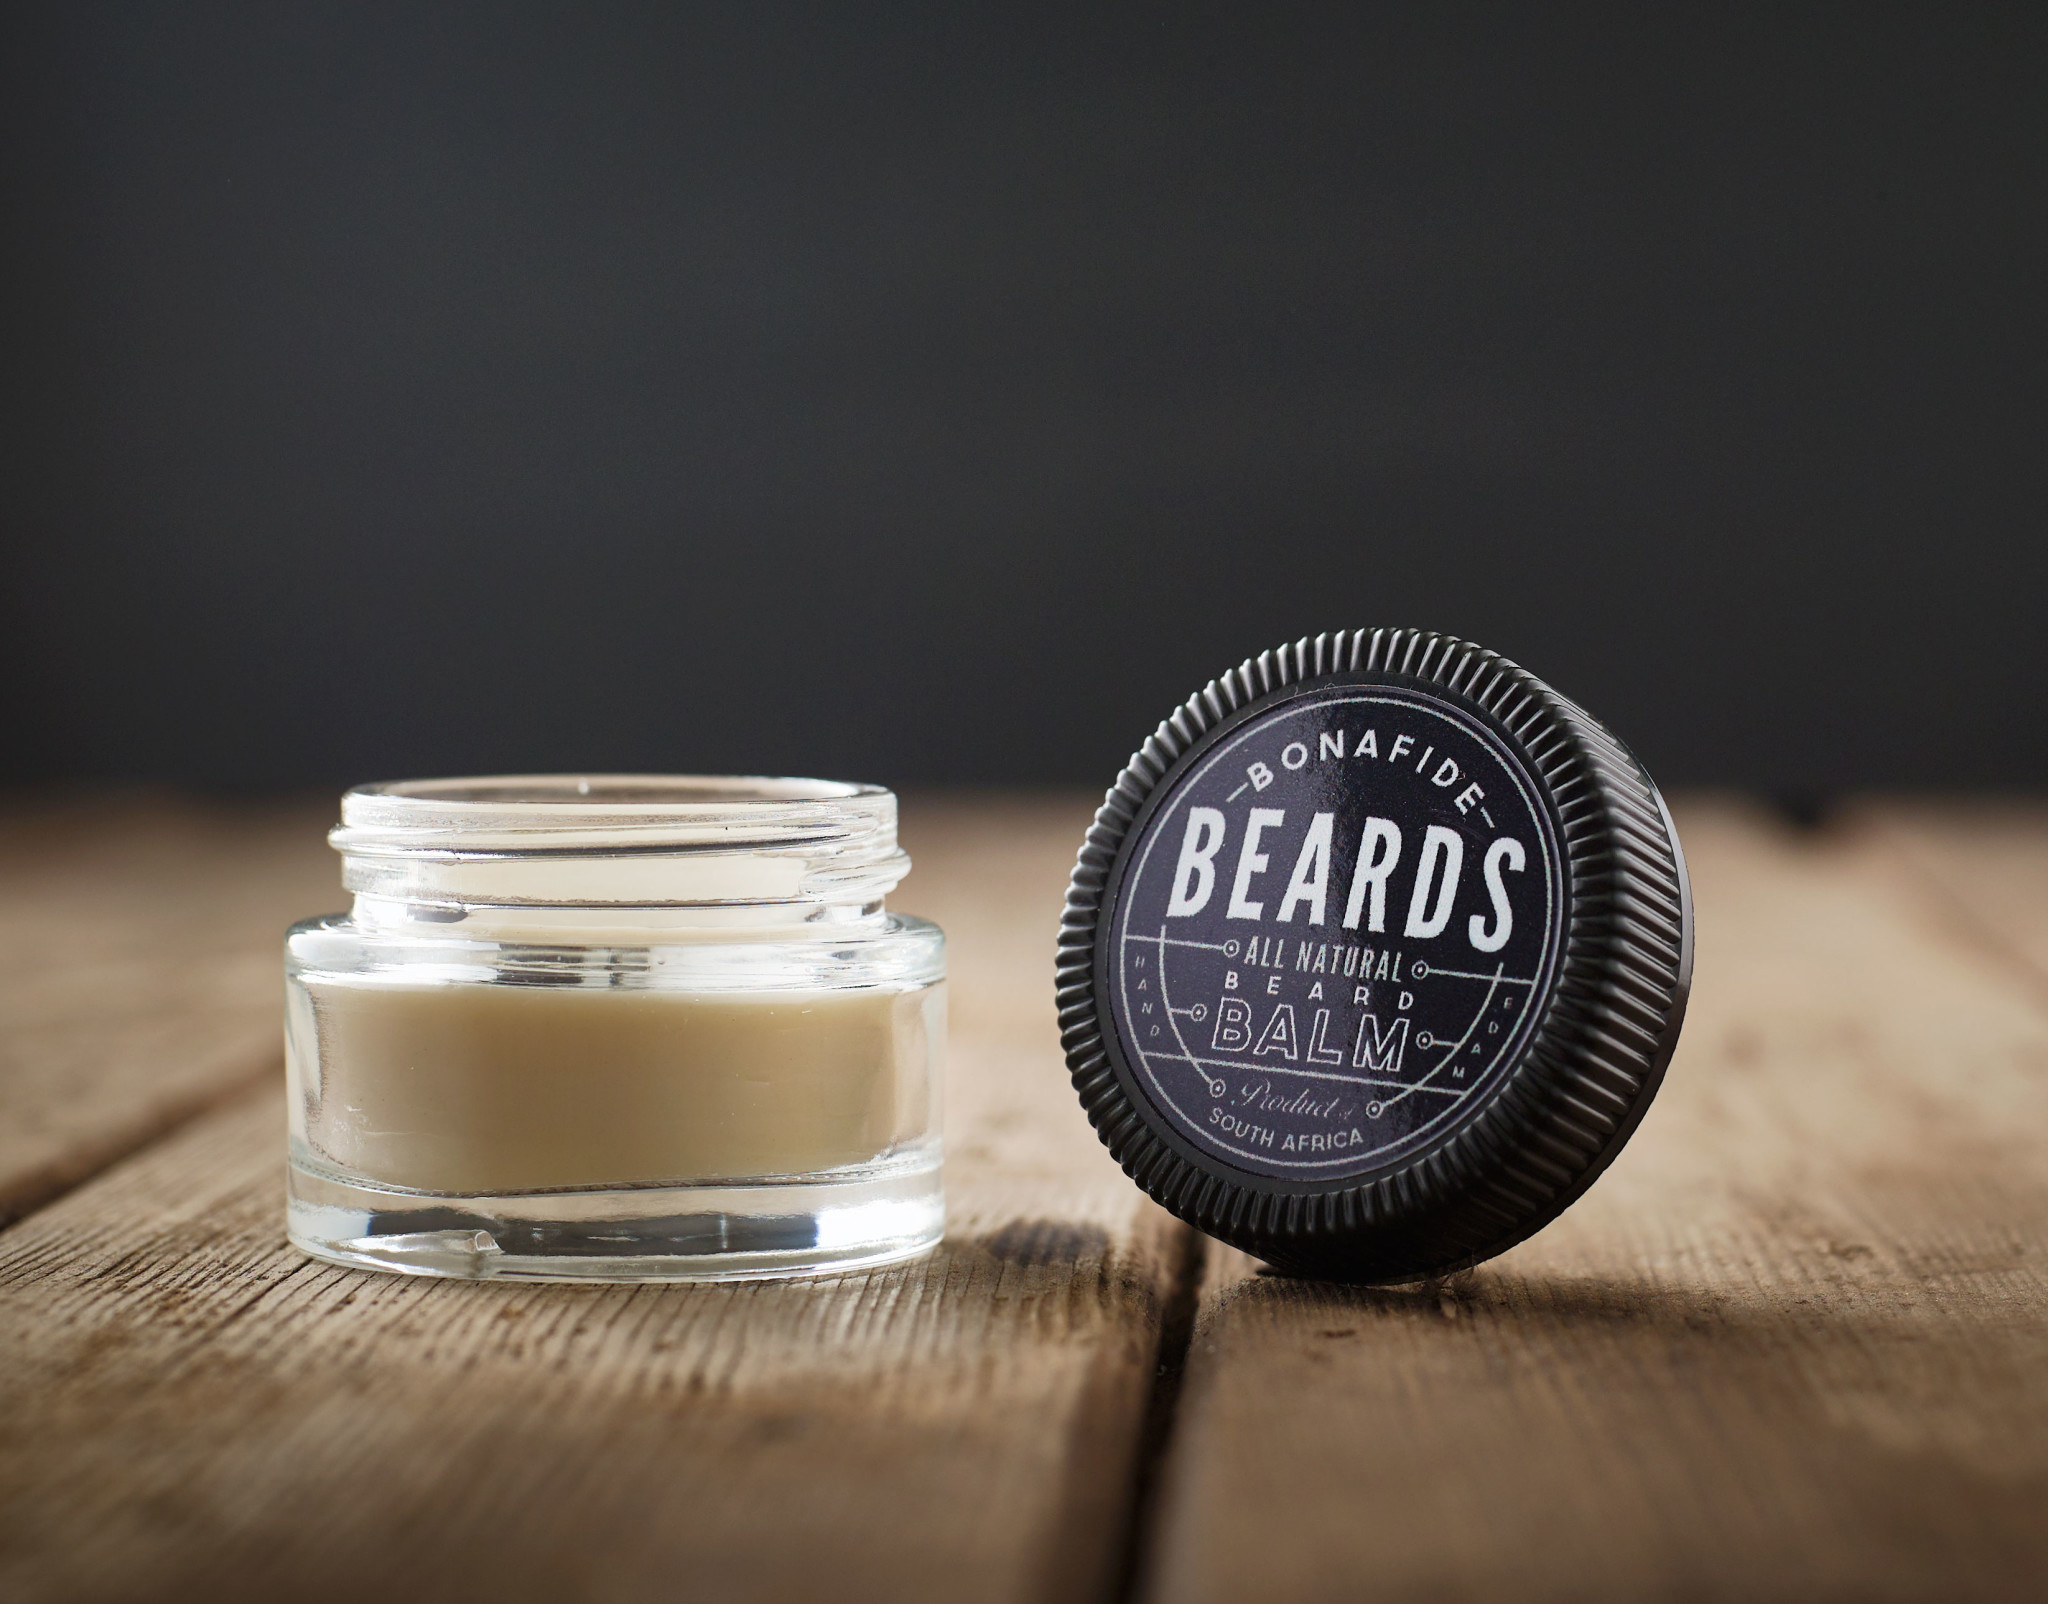 Bonafide Beards All Natural Balm